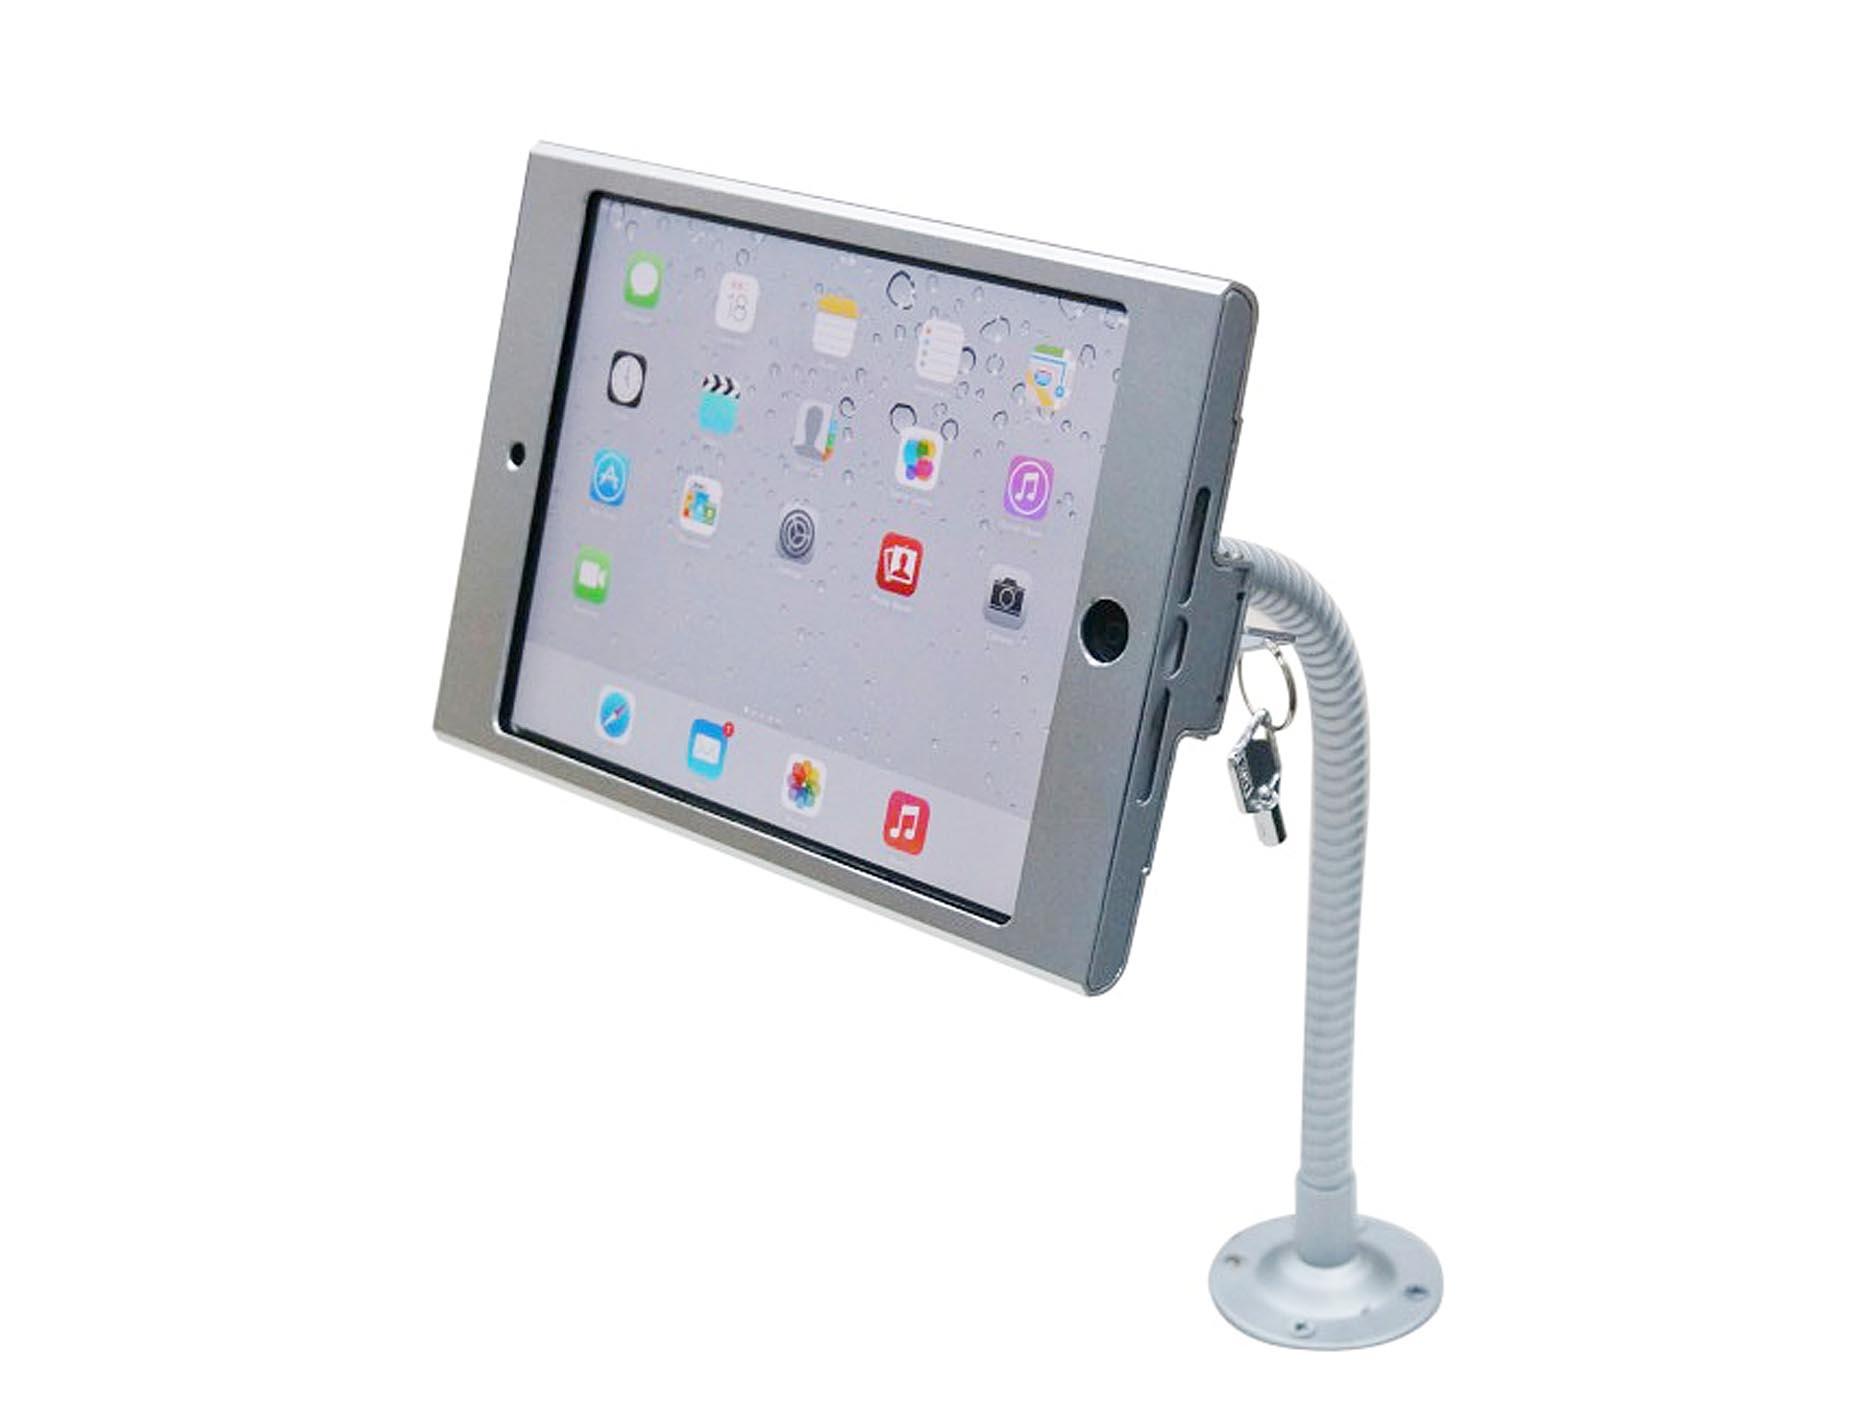 flexible gooseneck wall mount kiosk stand for ipad mini 4 ipad mini 3